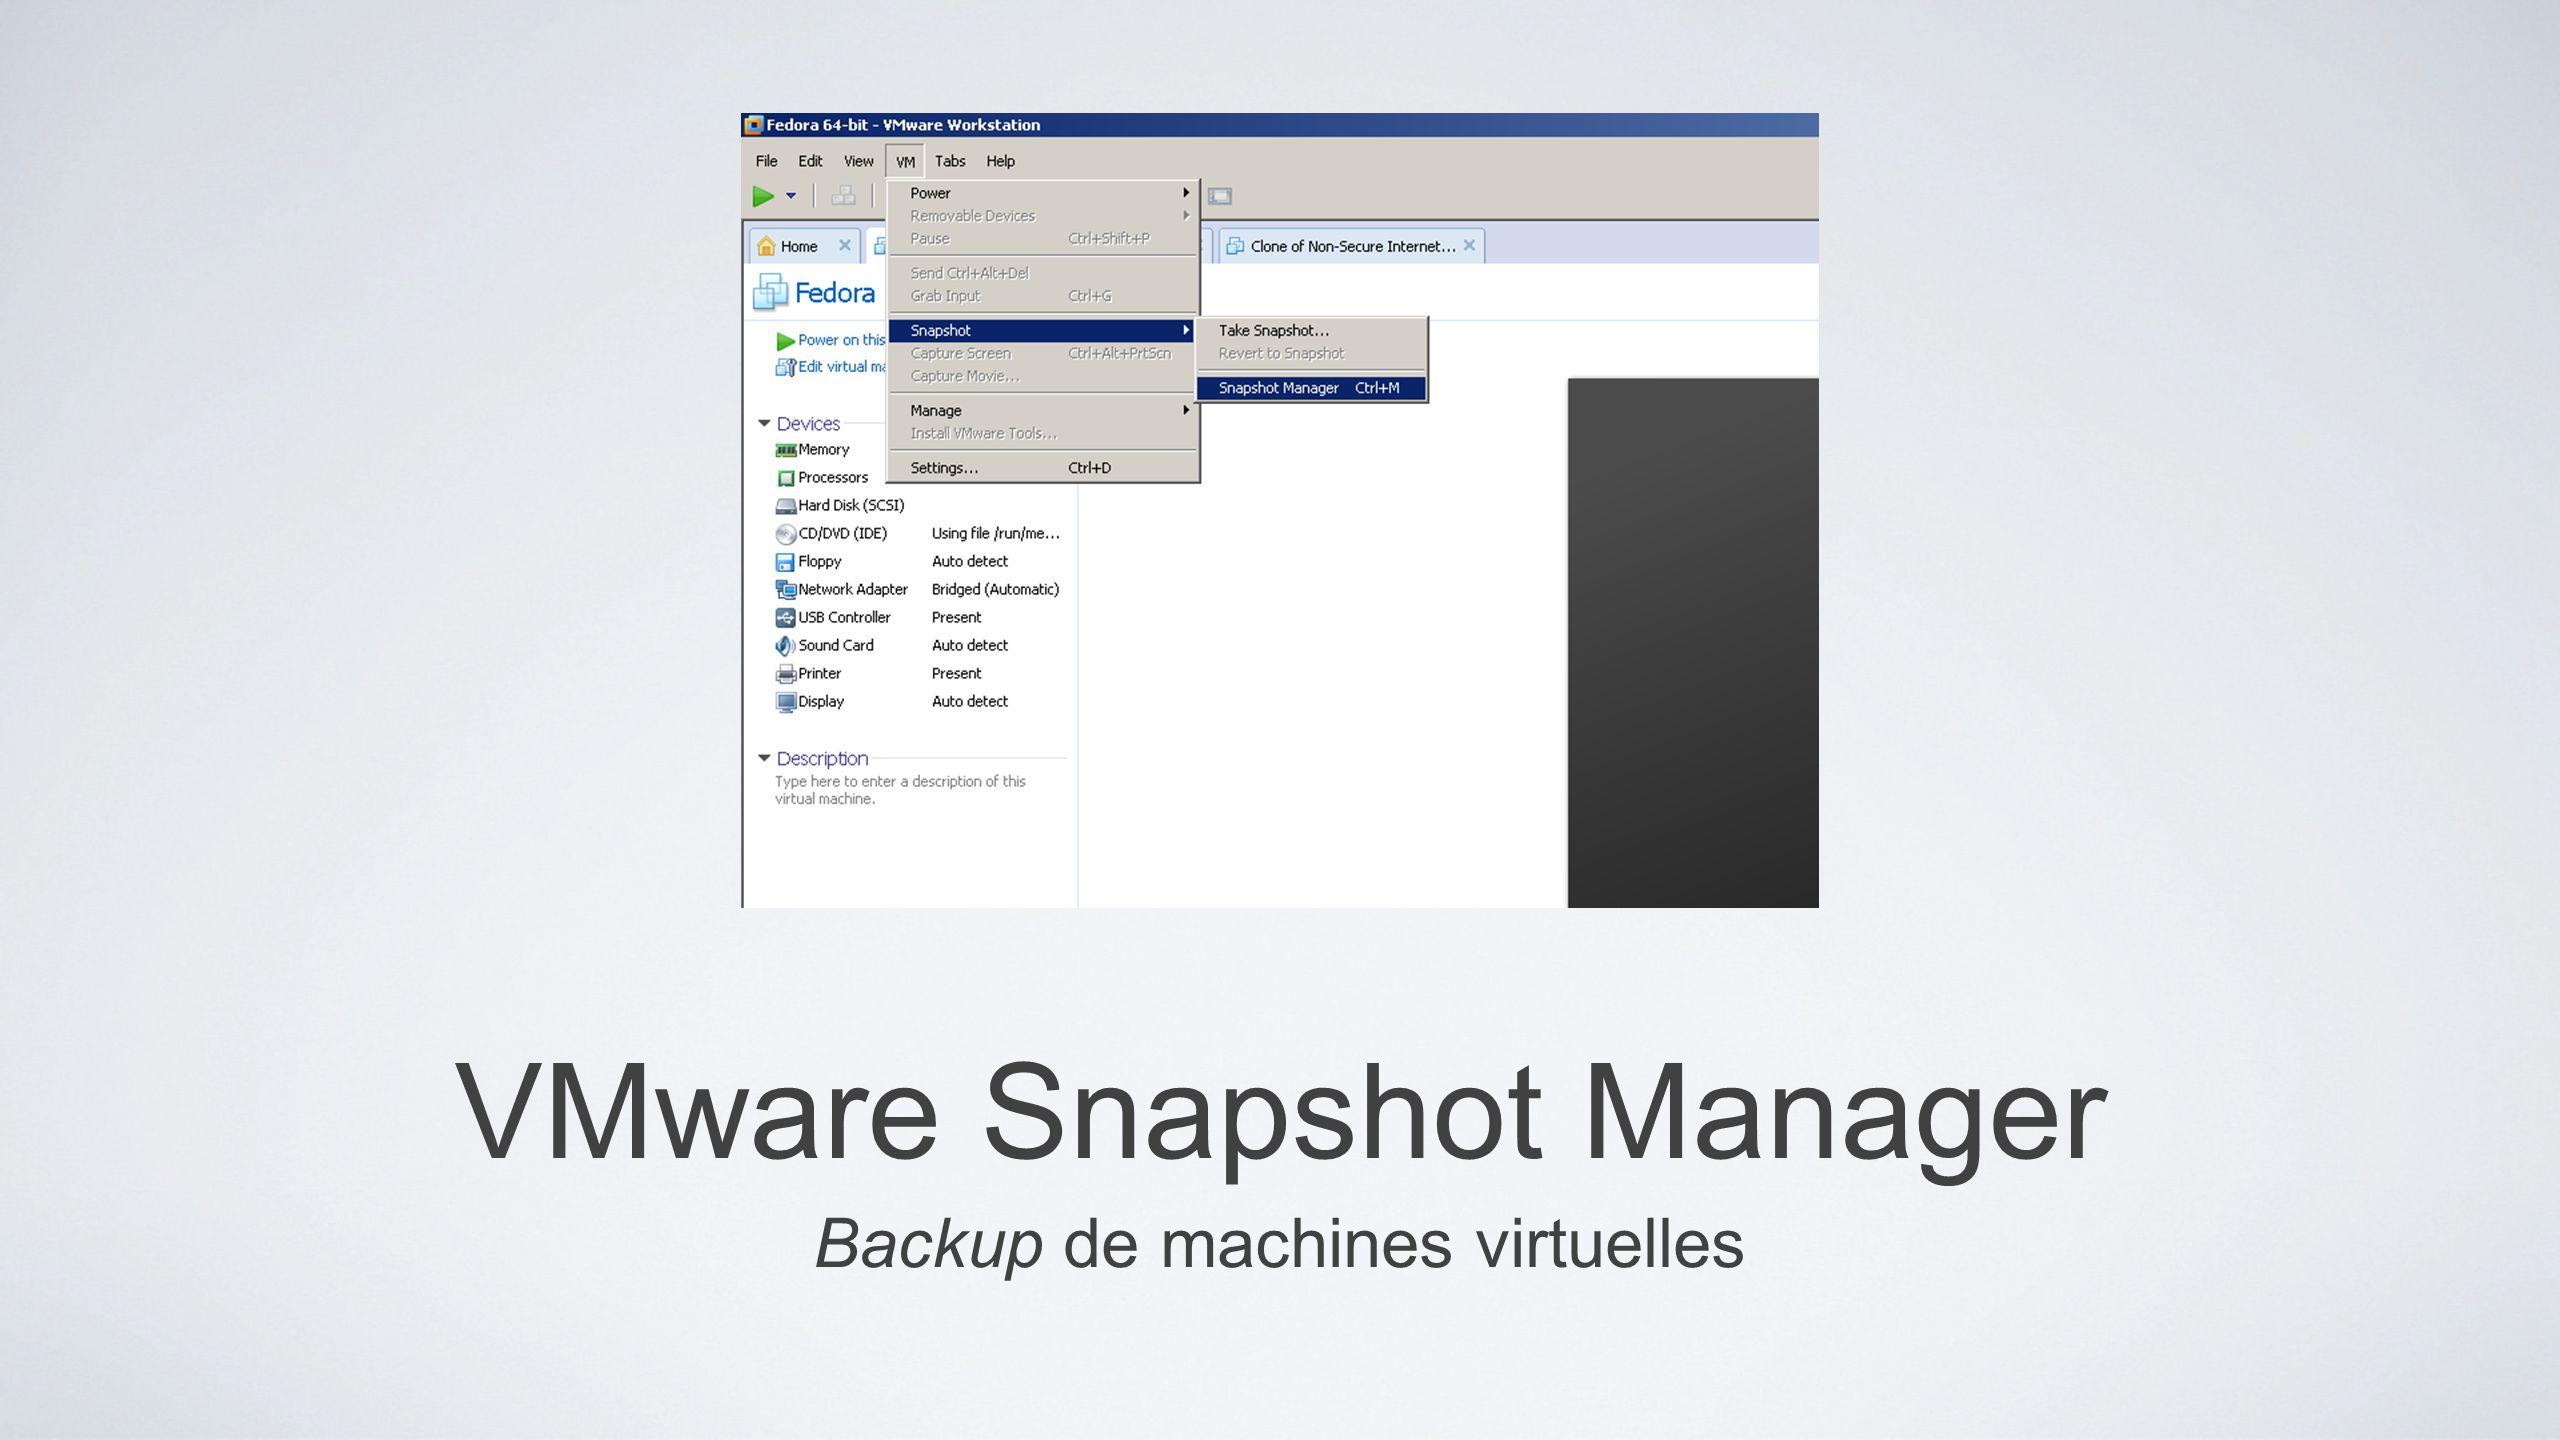 VMware Snapshot Manager